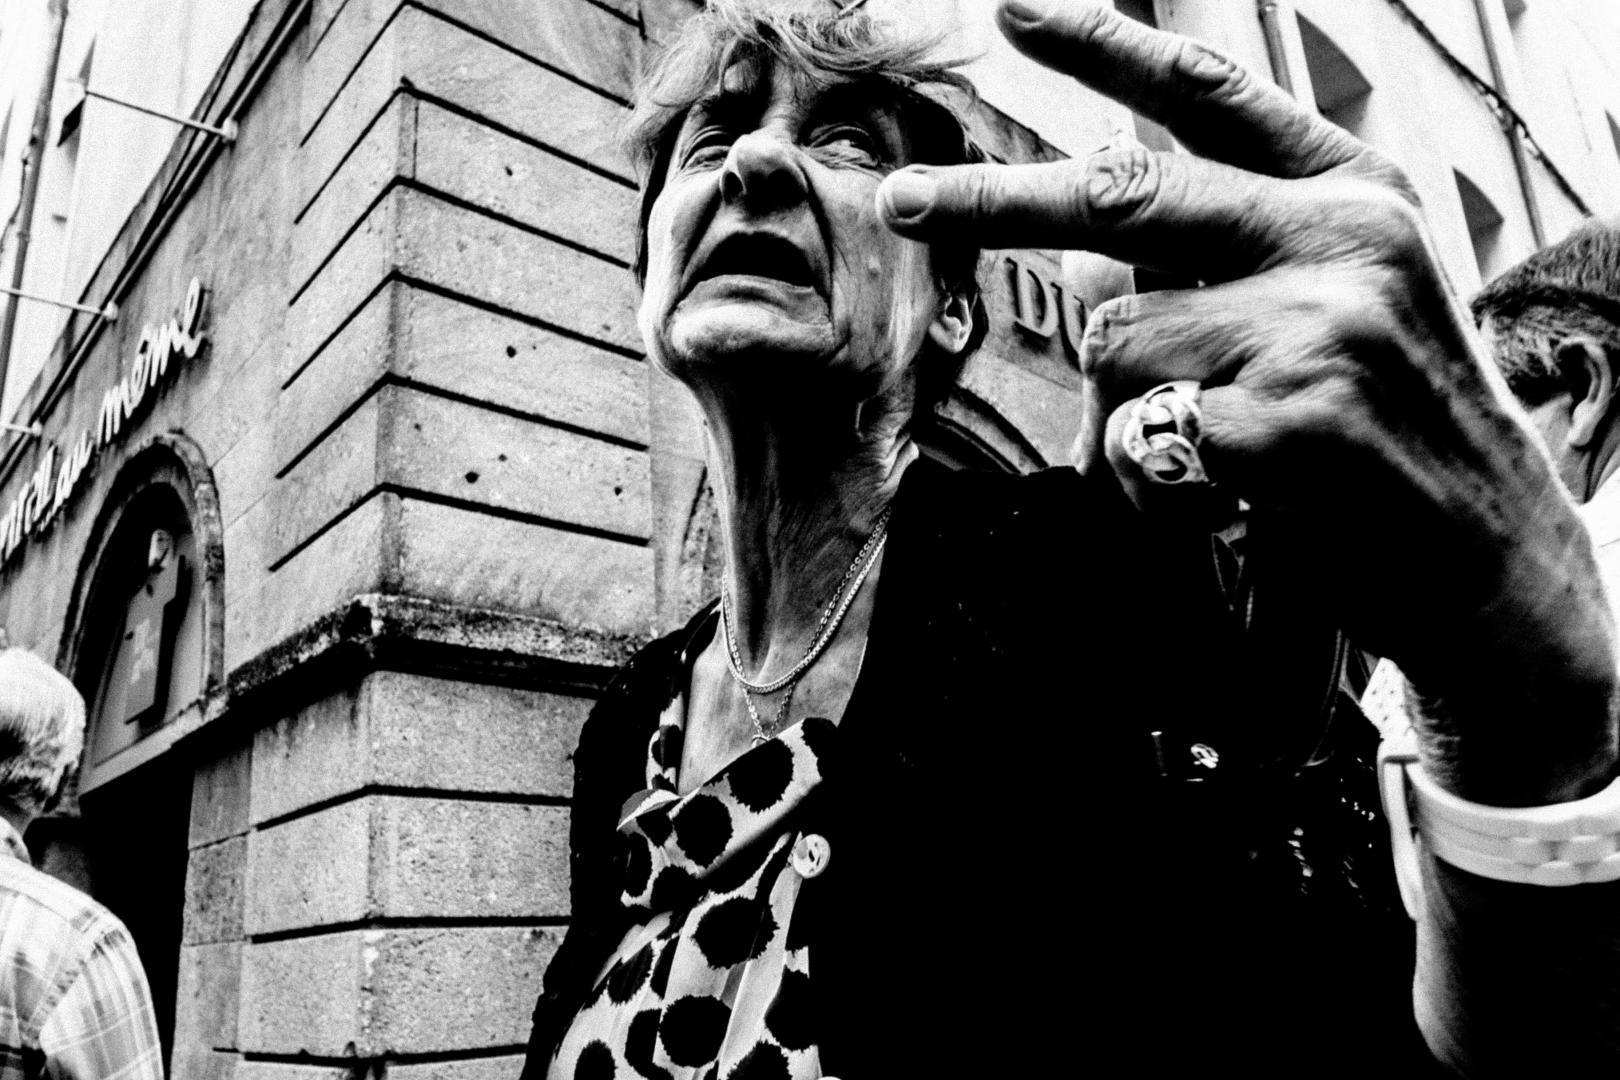 jeff-chane-mouye-street-photography-Aix-en-Provence-207